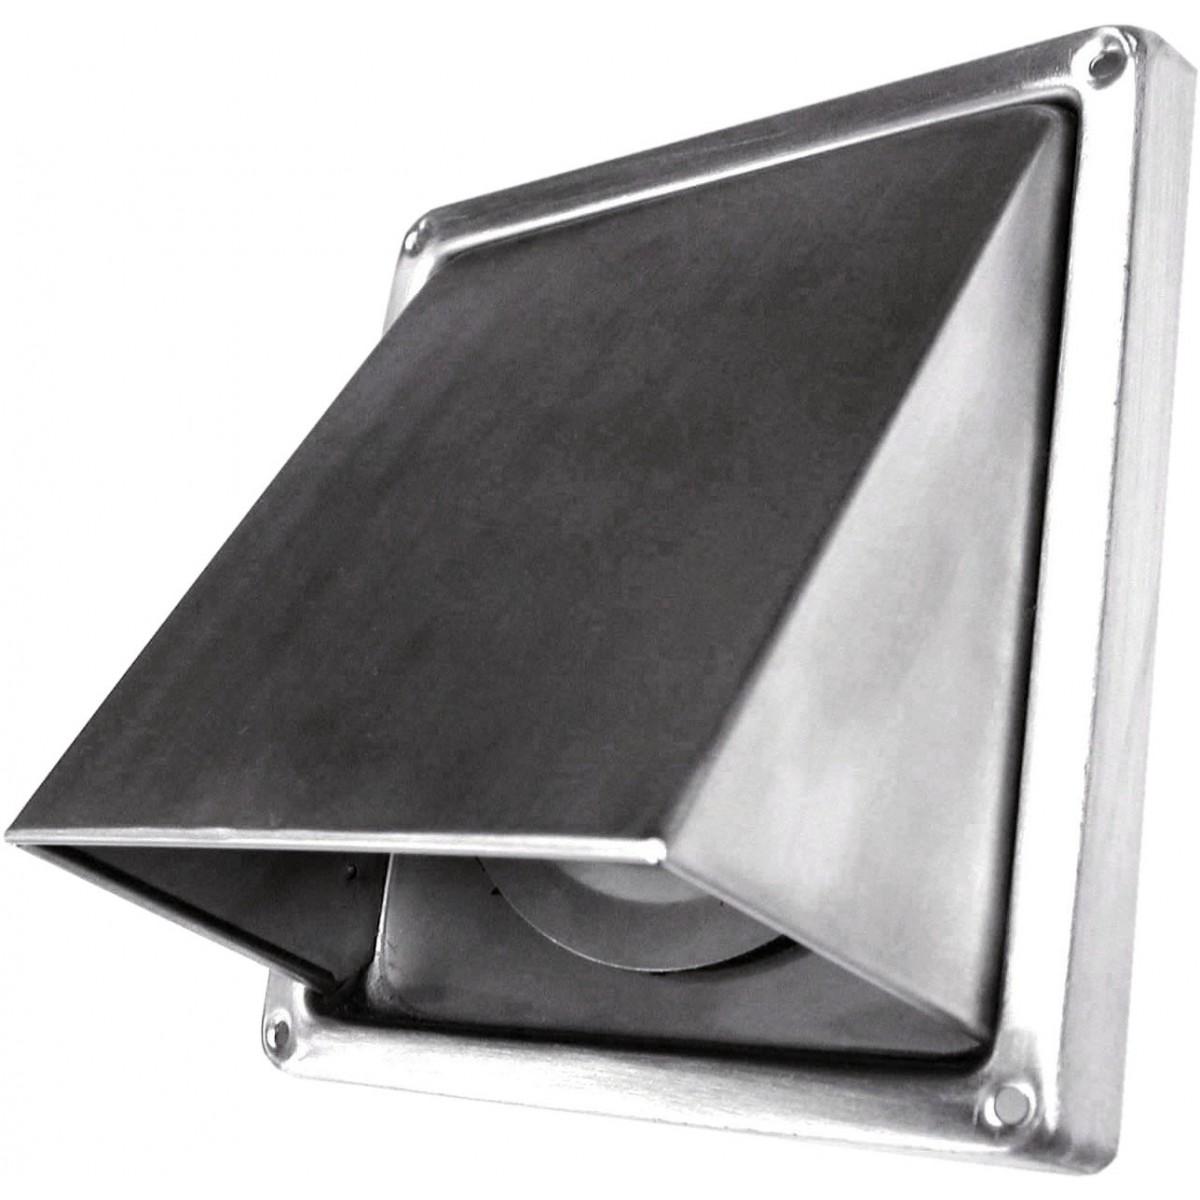 Grille inox DMO - A auvent - Diamètre 100 mm